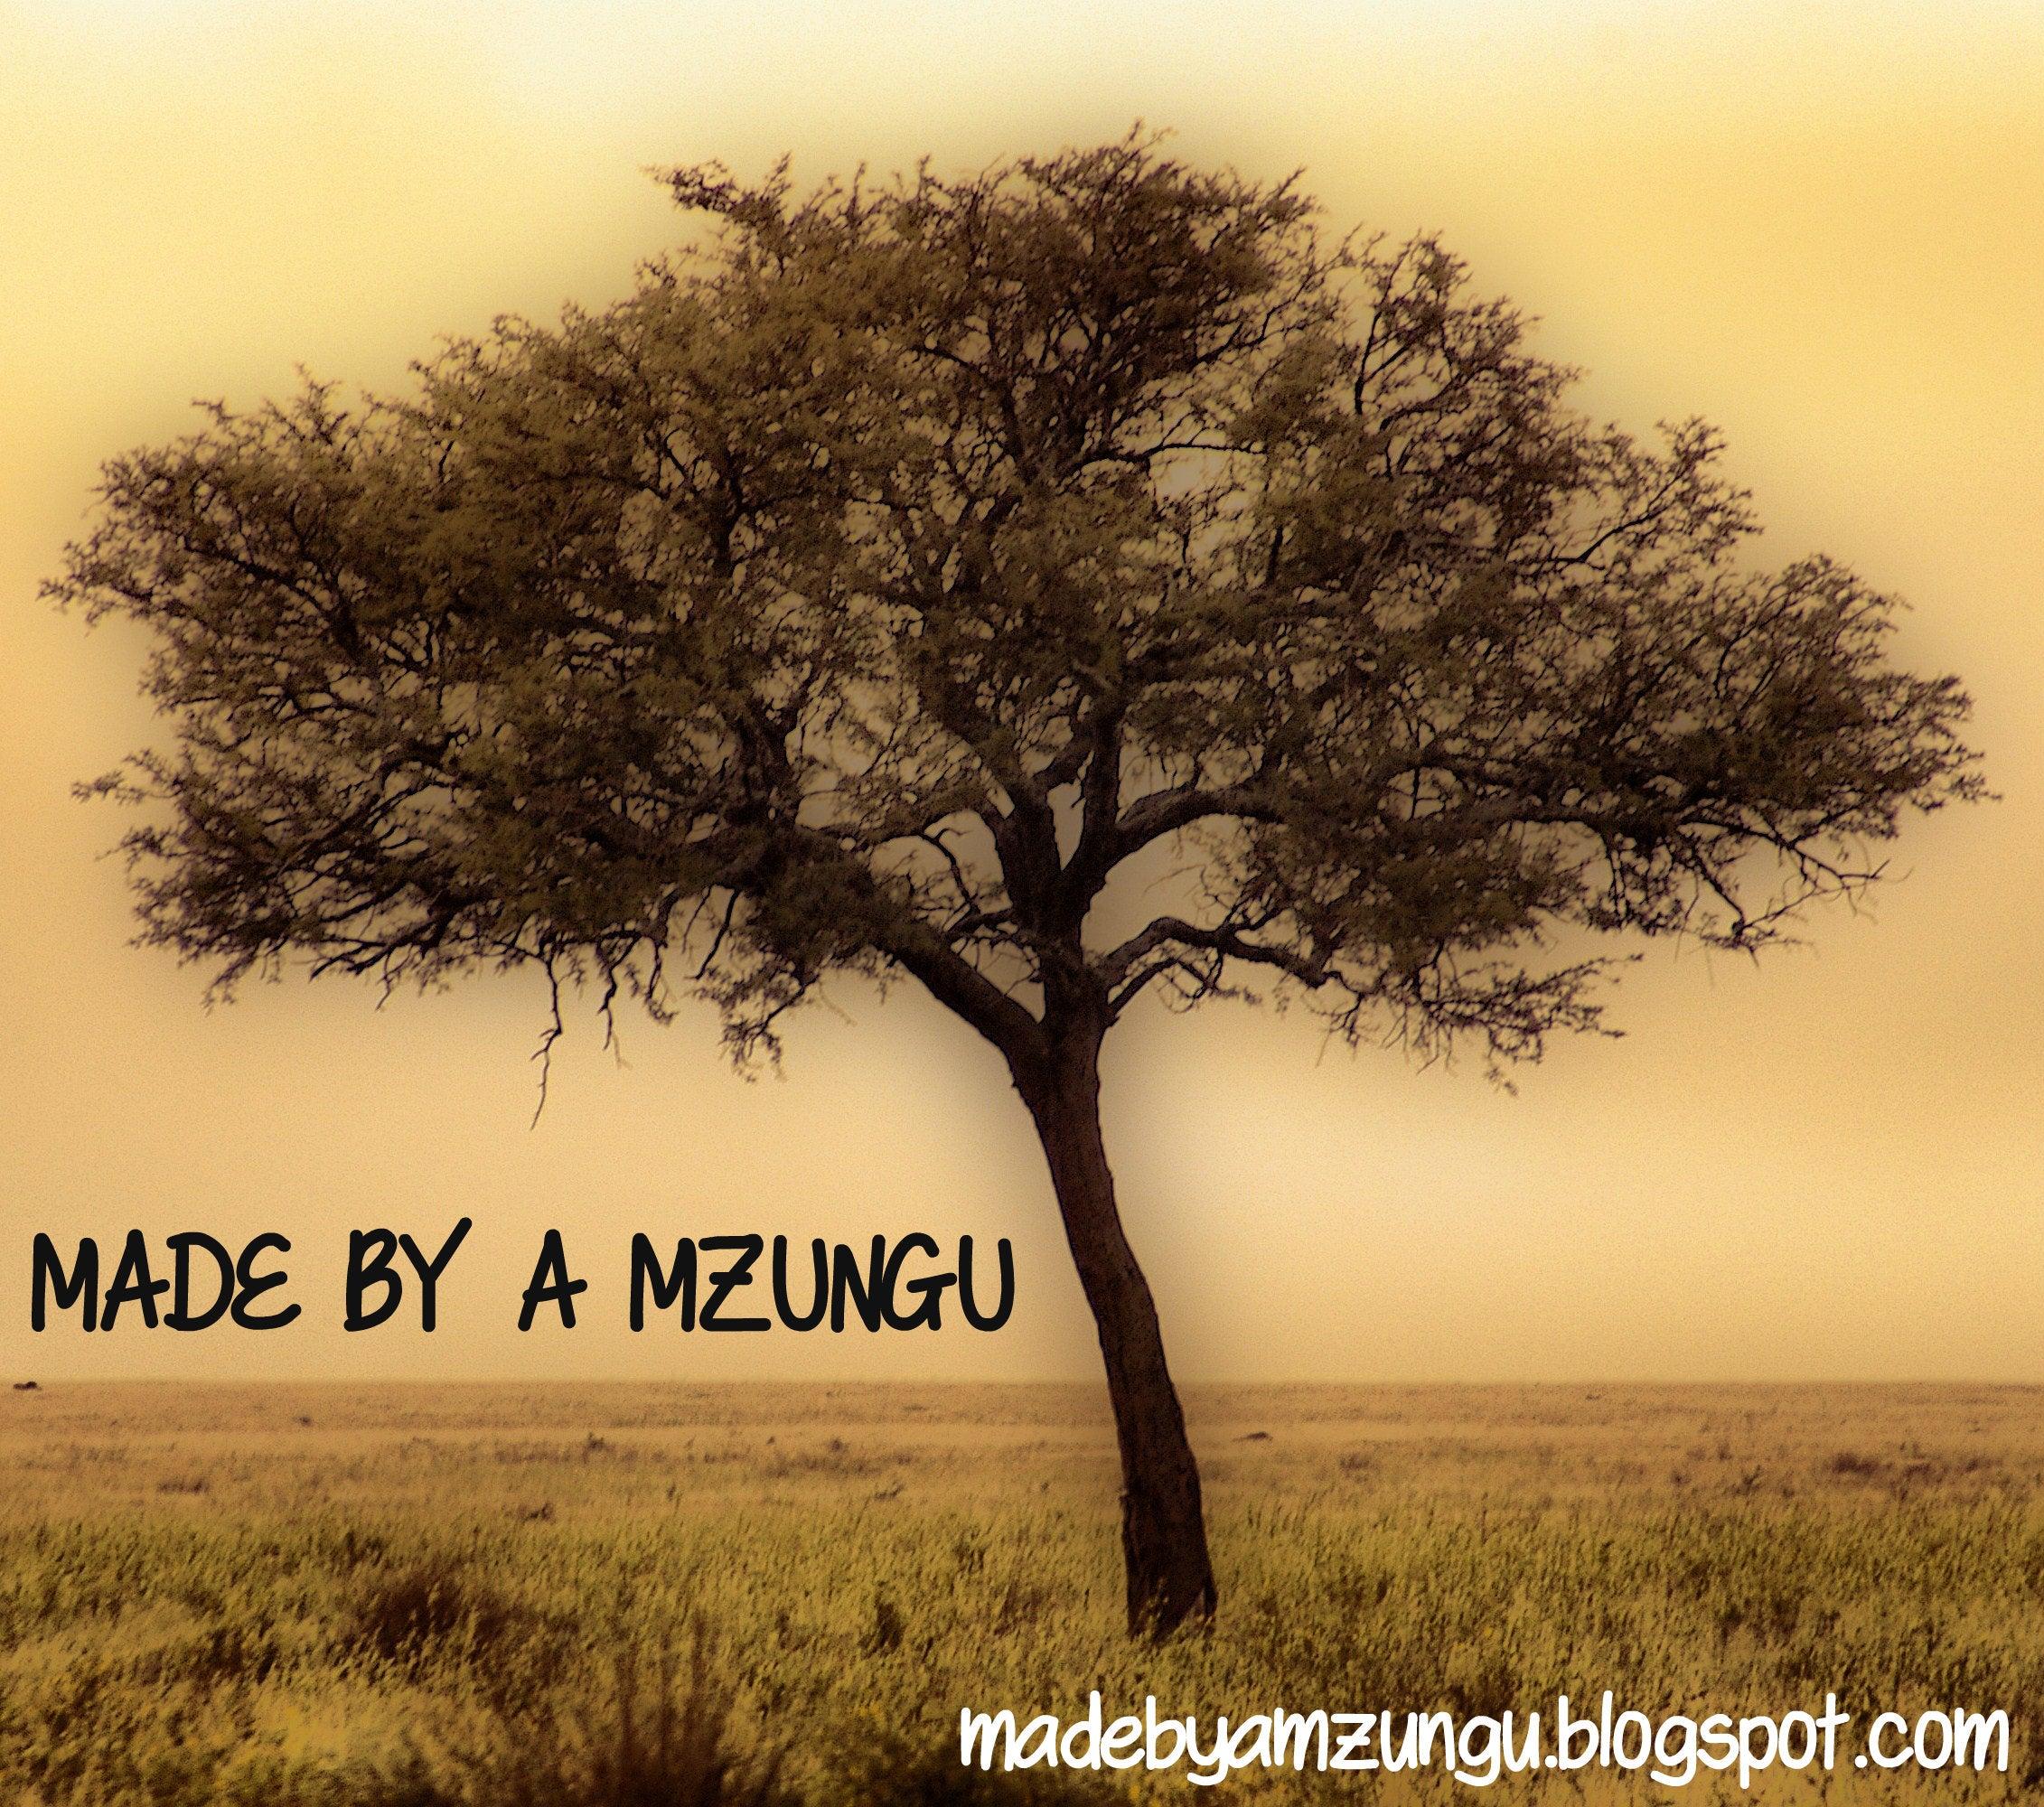 Made by a Mzungu